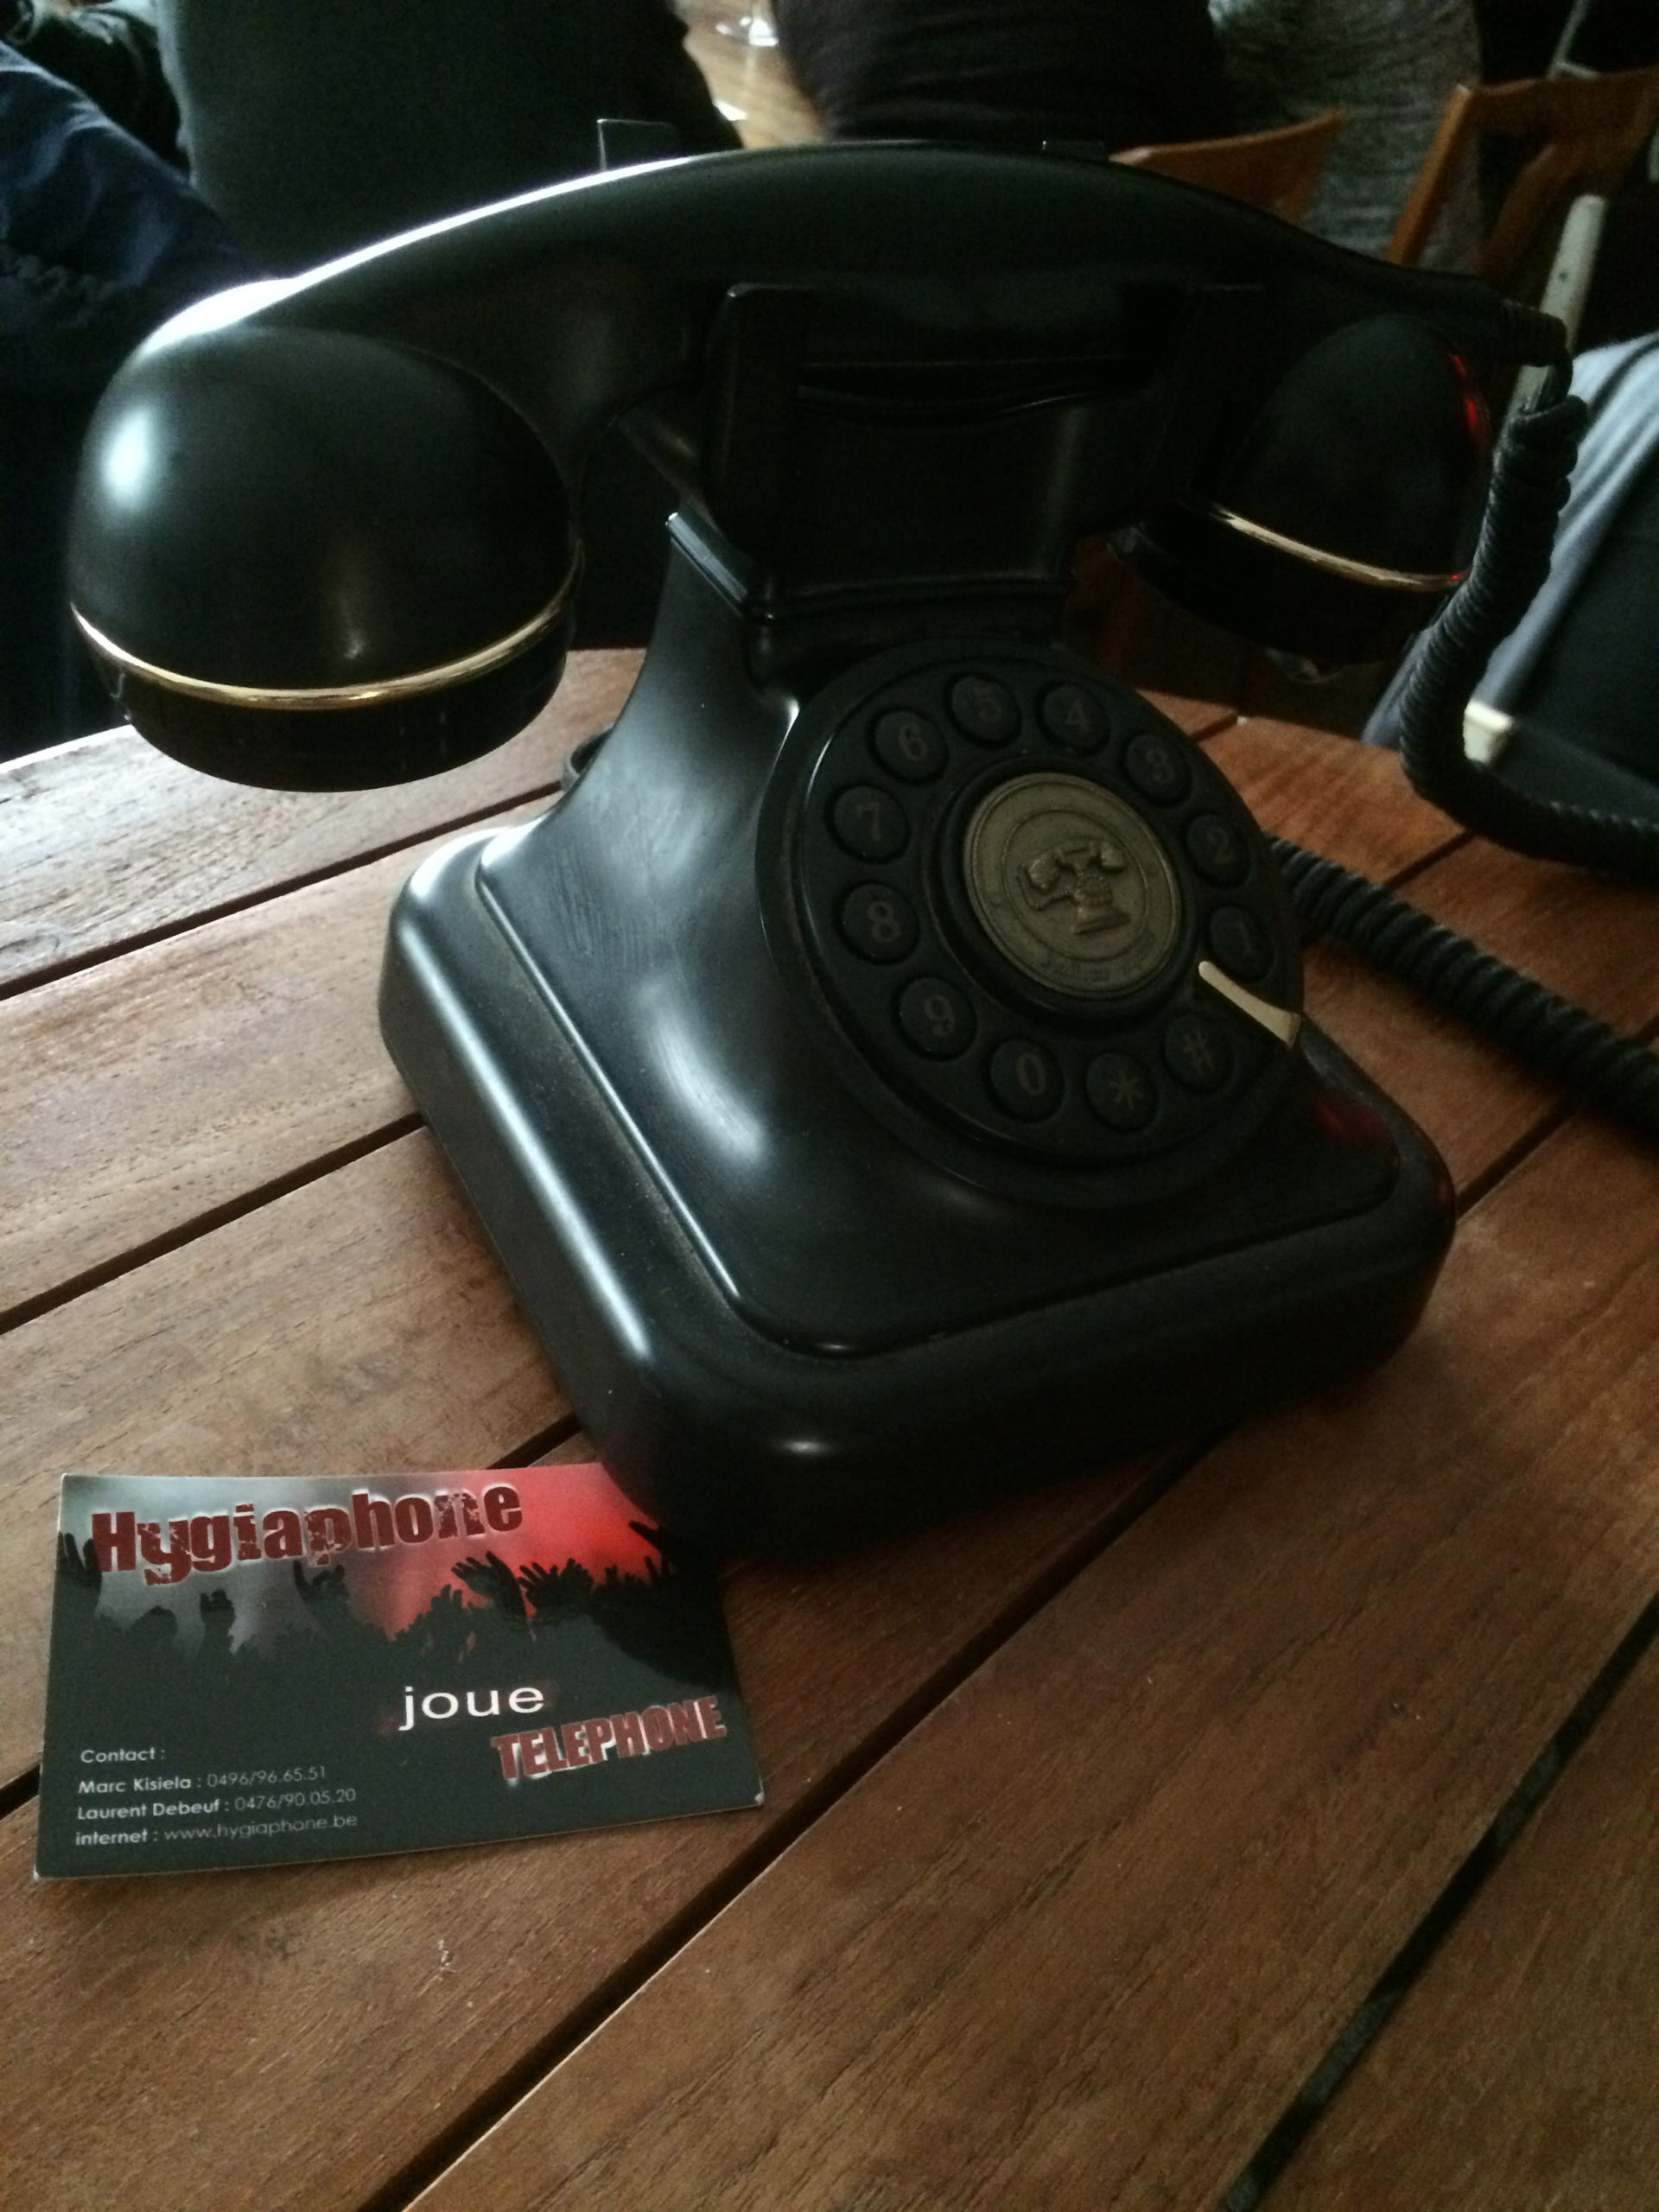 Hygiaphone-3